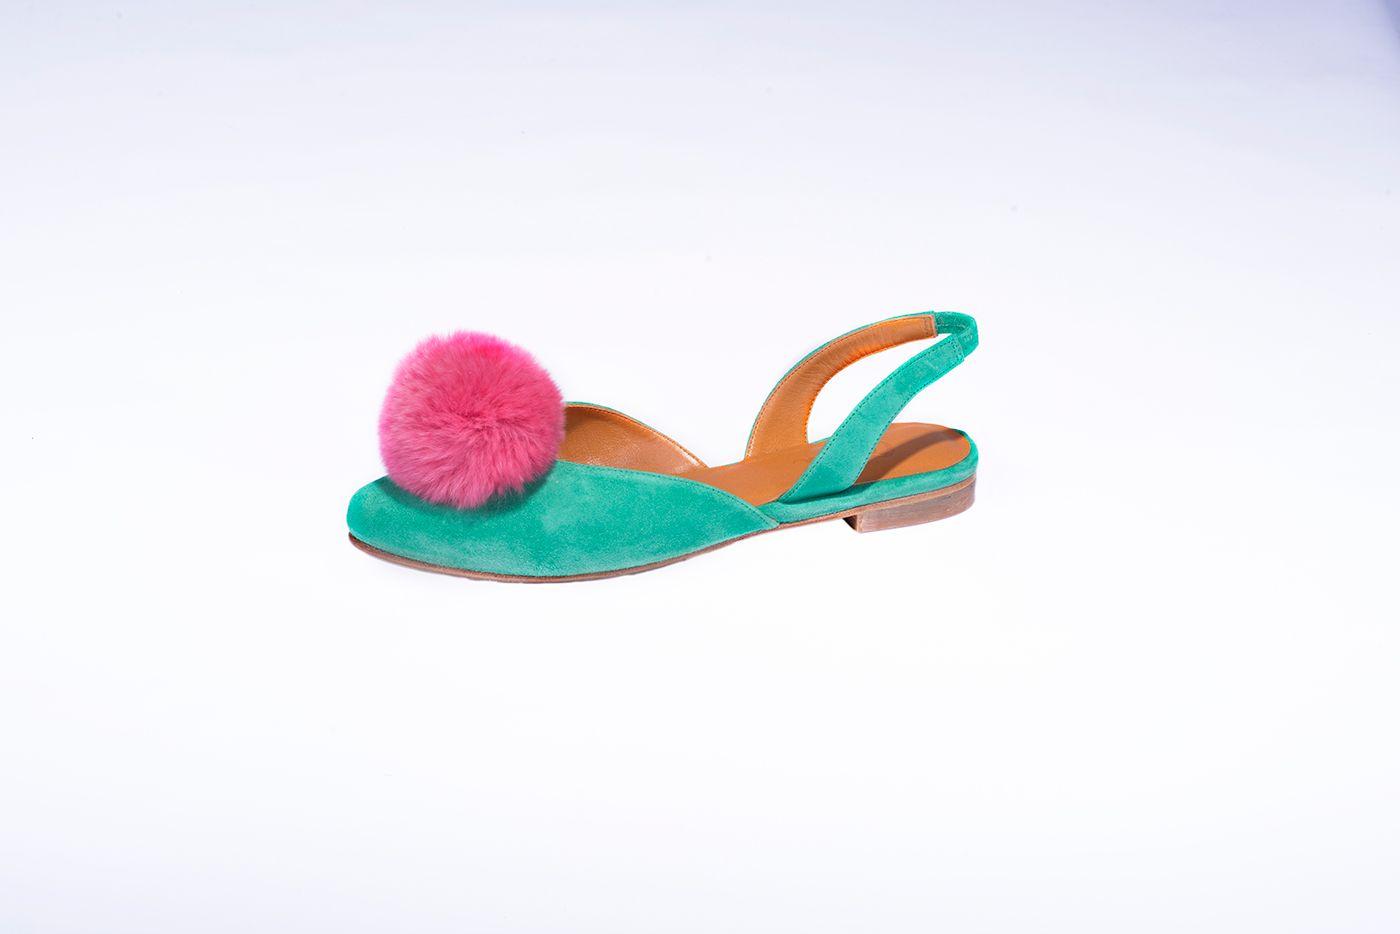 Sandalias de la colección de verano modelo Hortensia, Antia